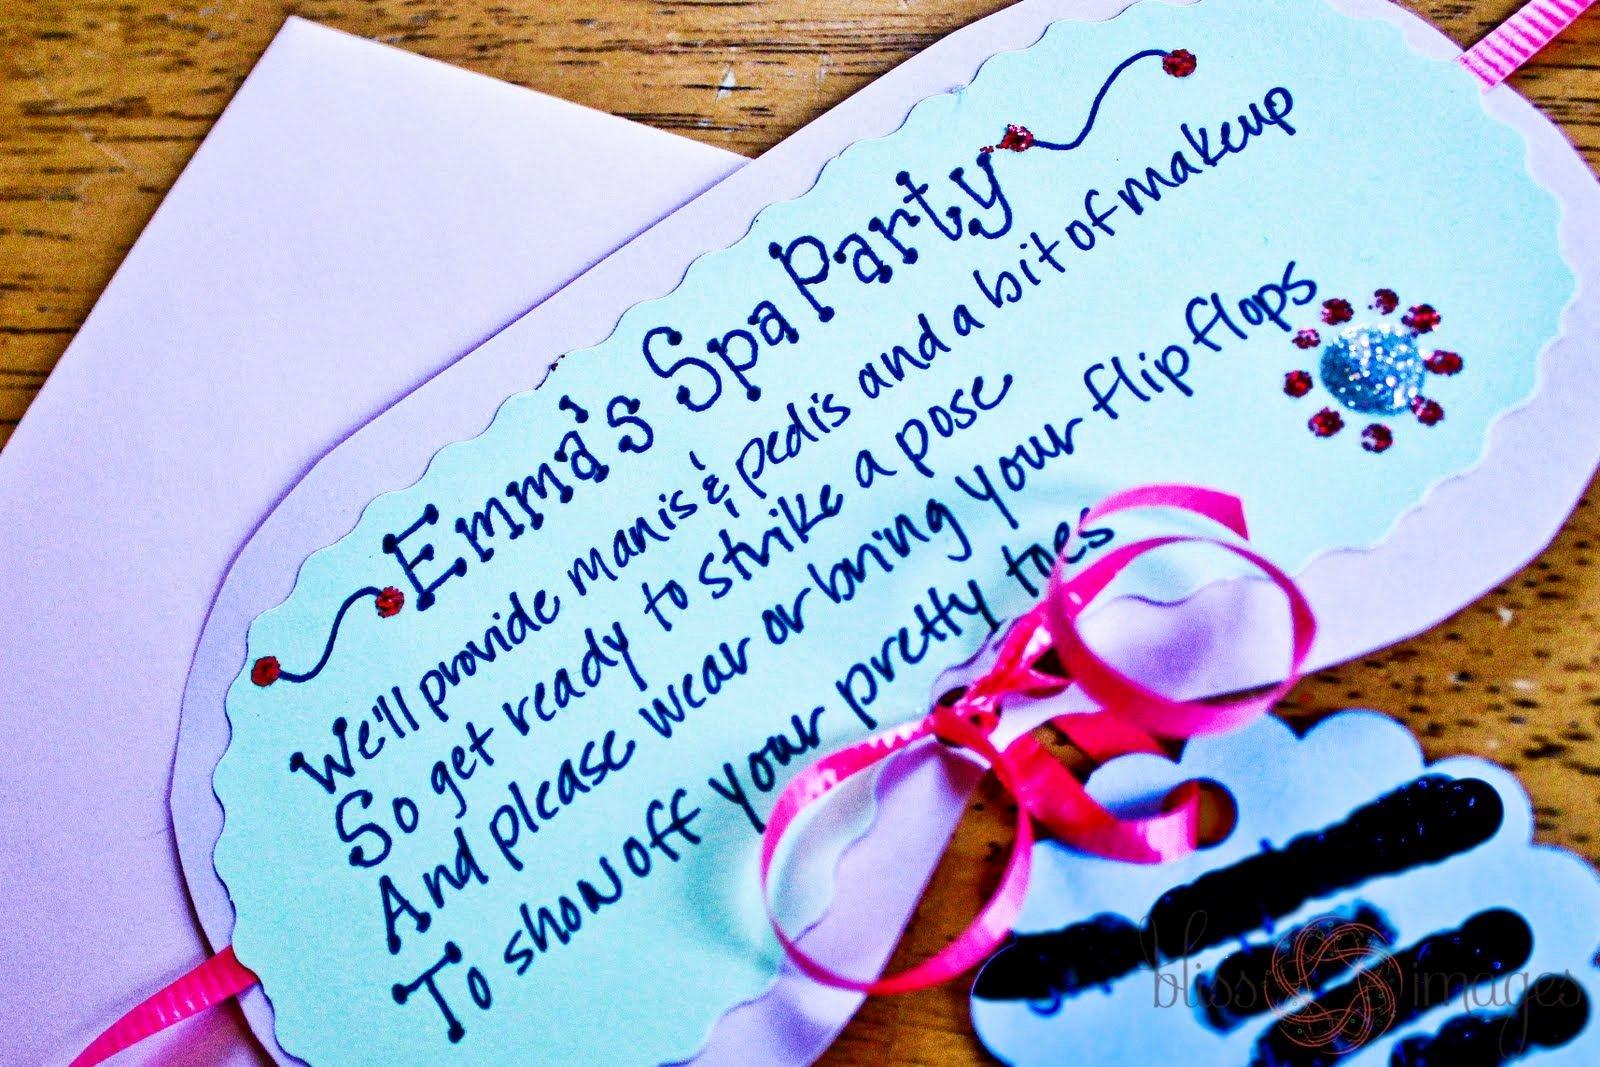 Spa Party Invitations Templates Free Beautiful Free Spa Party Invitation Template